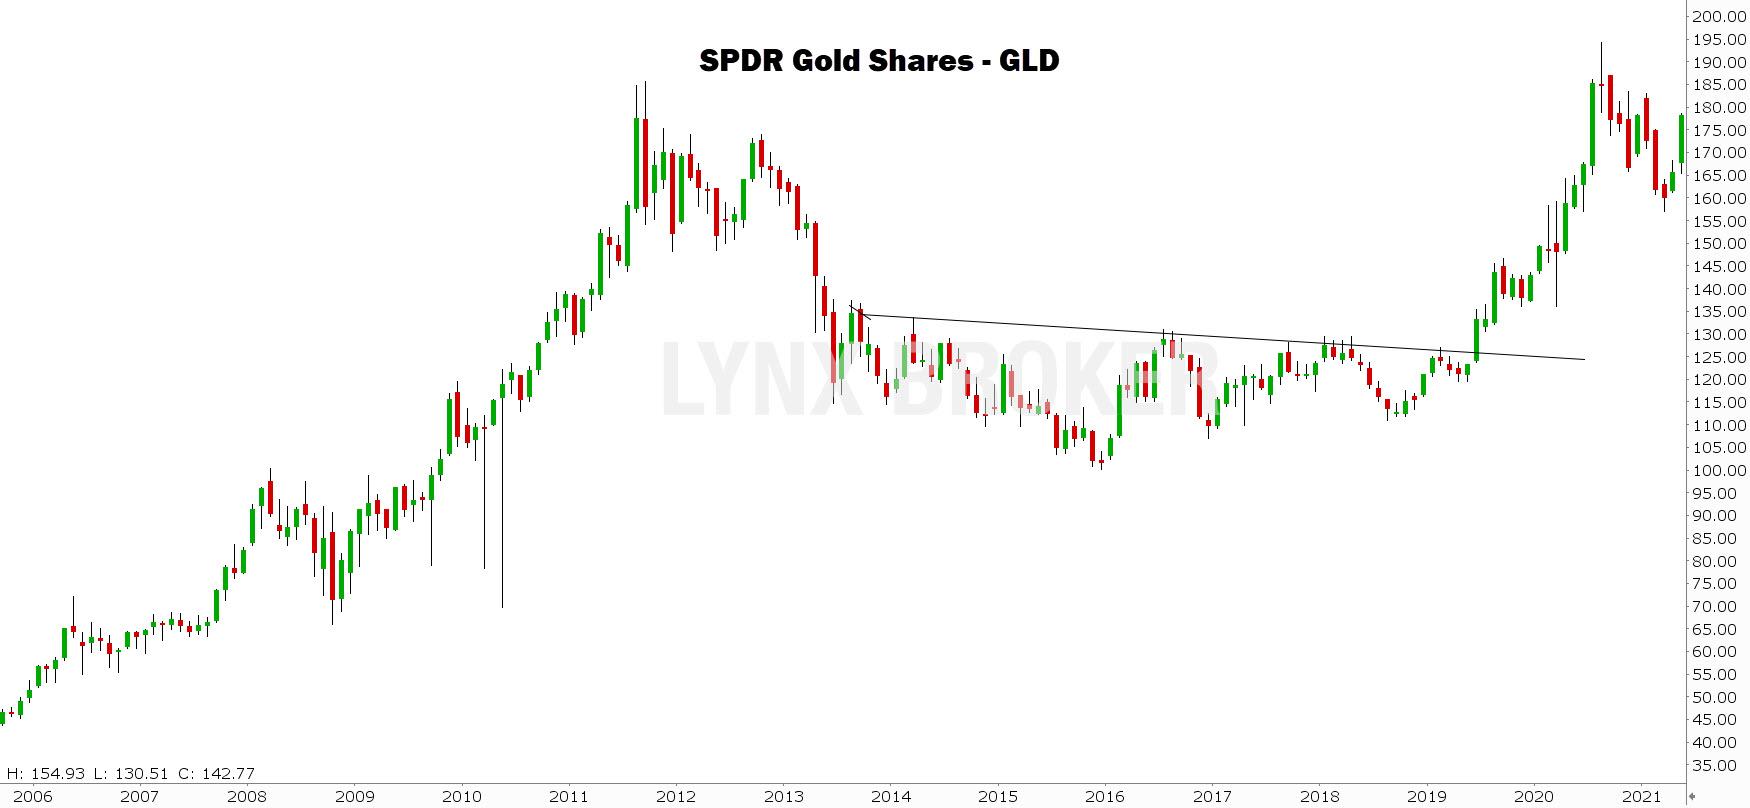 prix de l'or graphique mensuel GLD